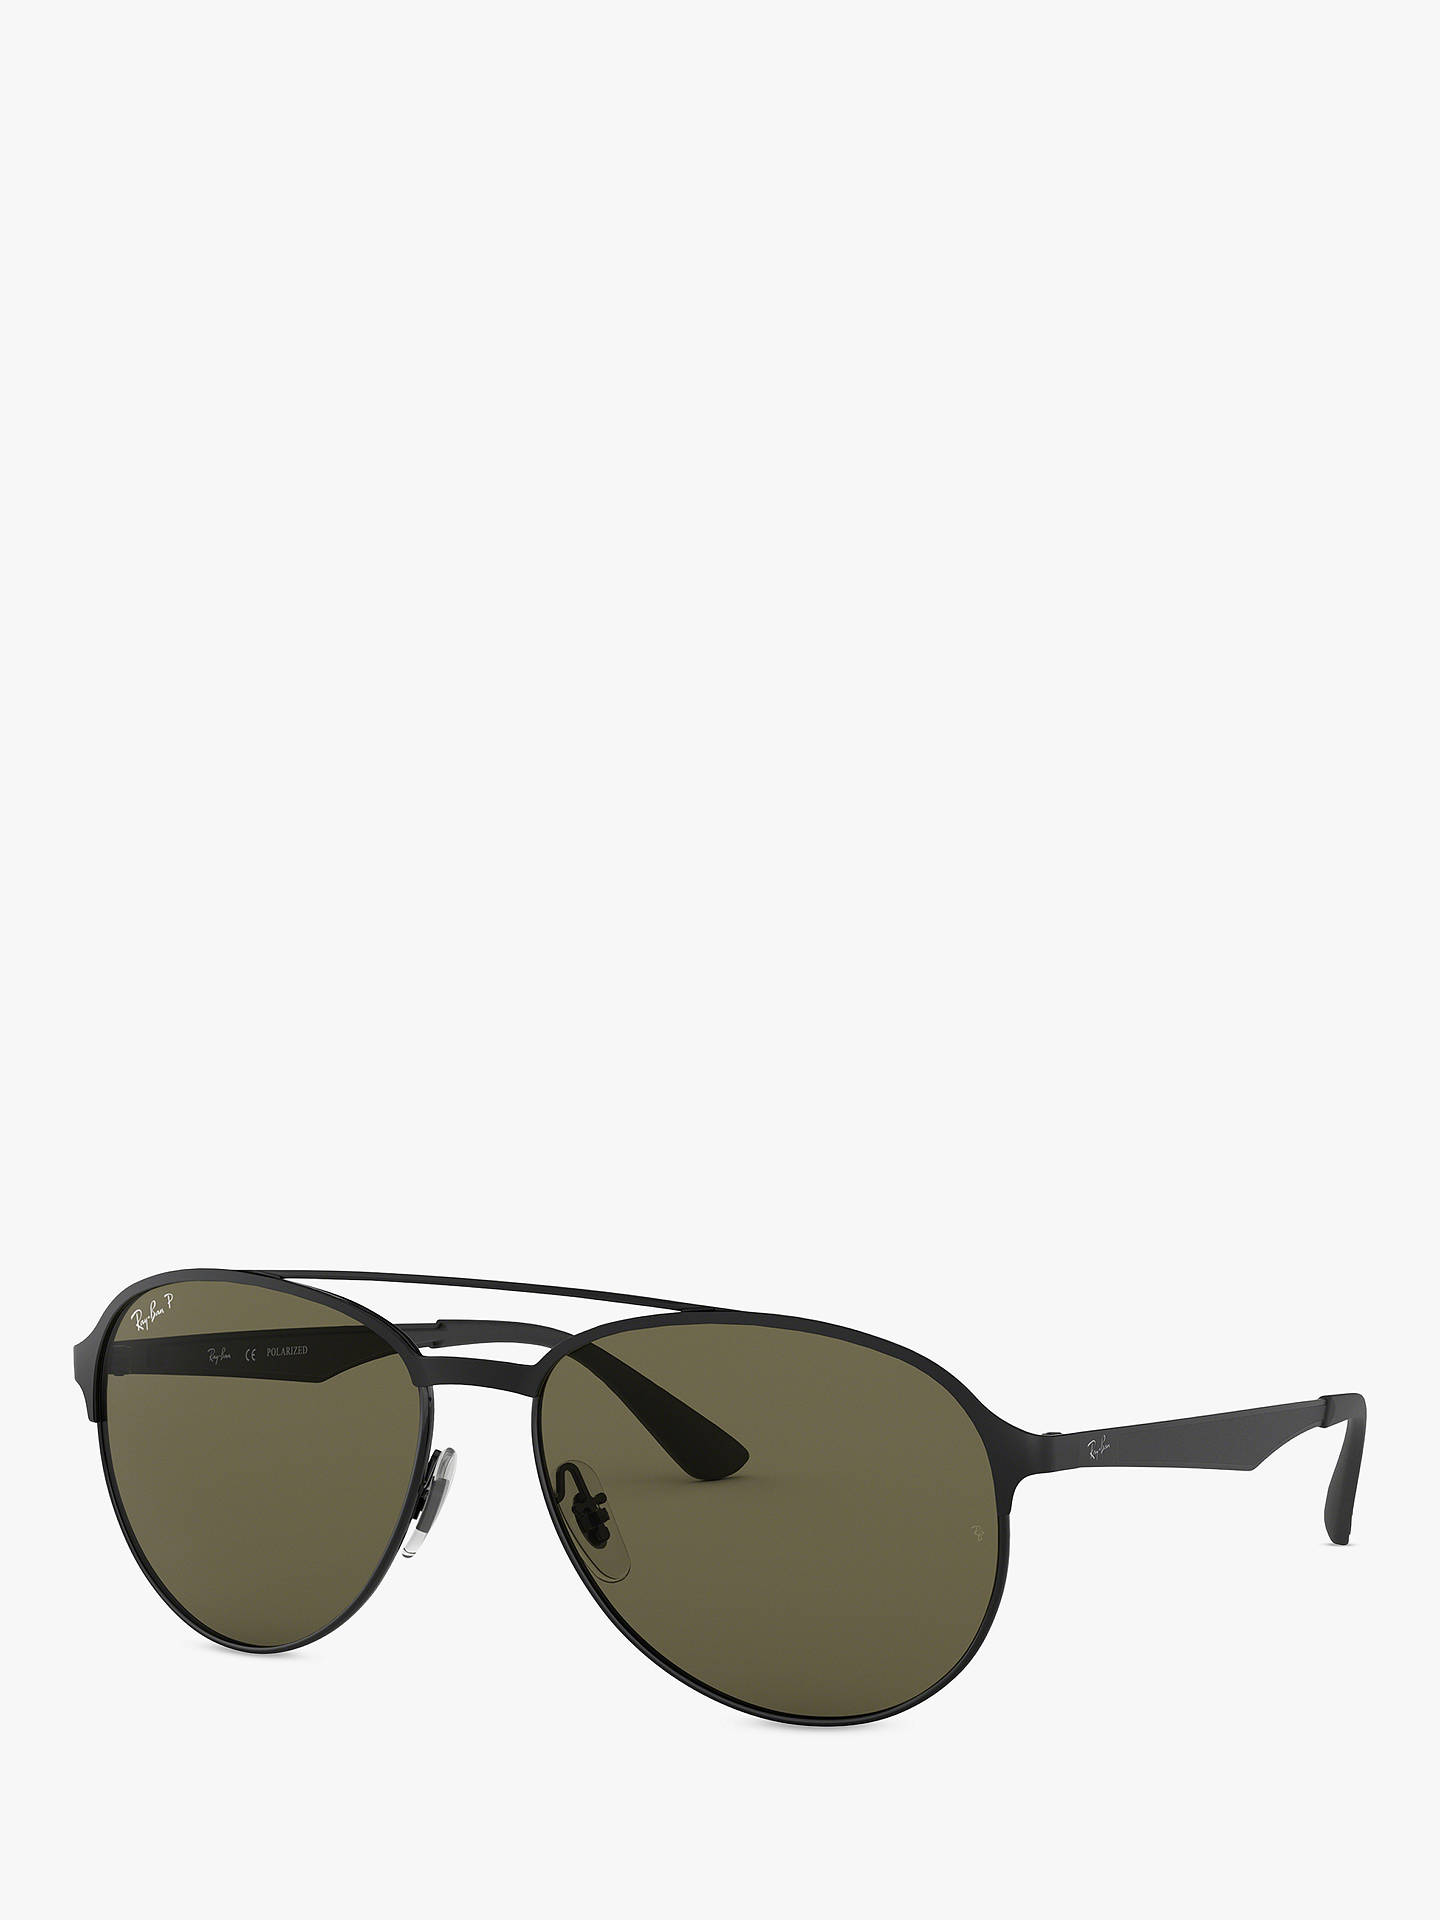 Ray Ban Rb3606 Men S Polarised Aviator Sunglasses Matte Black Green